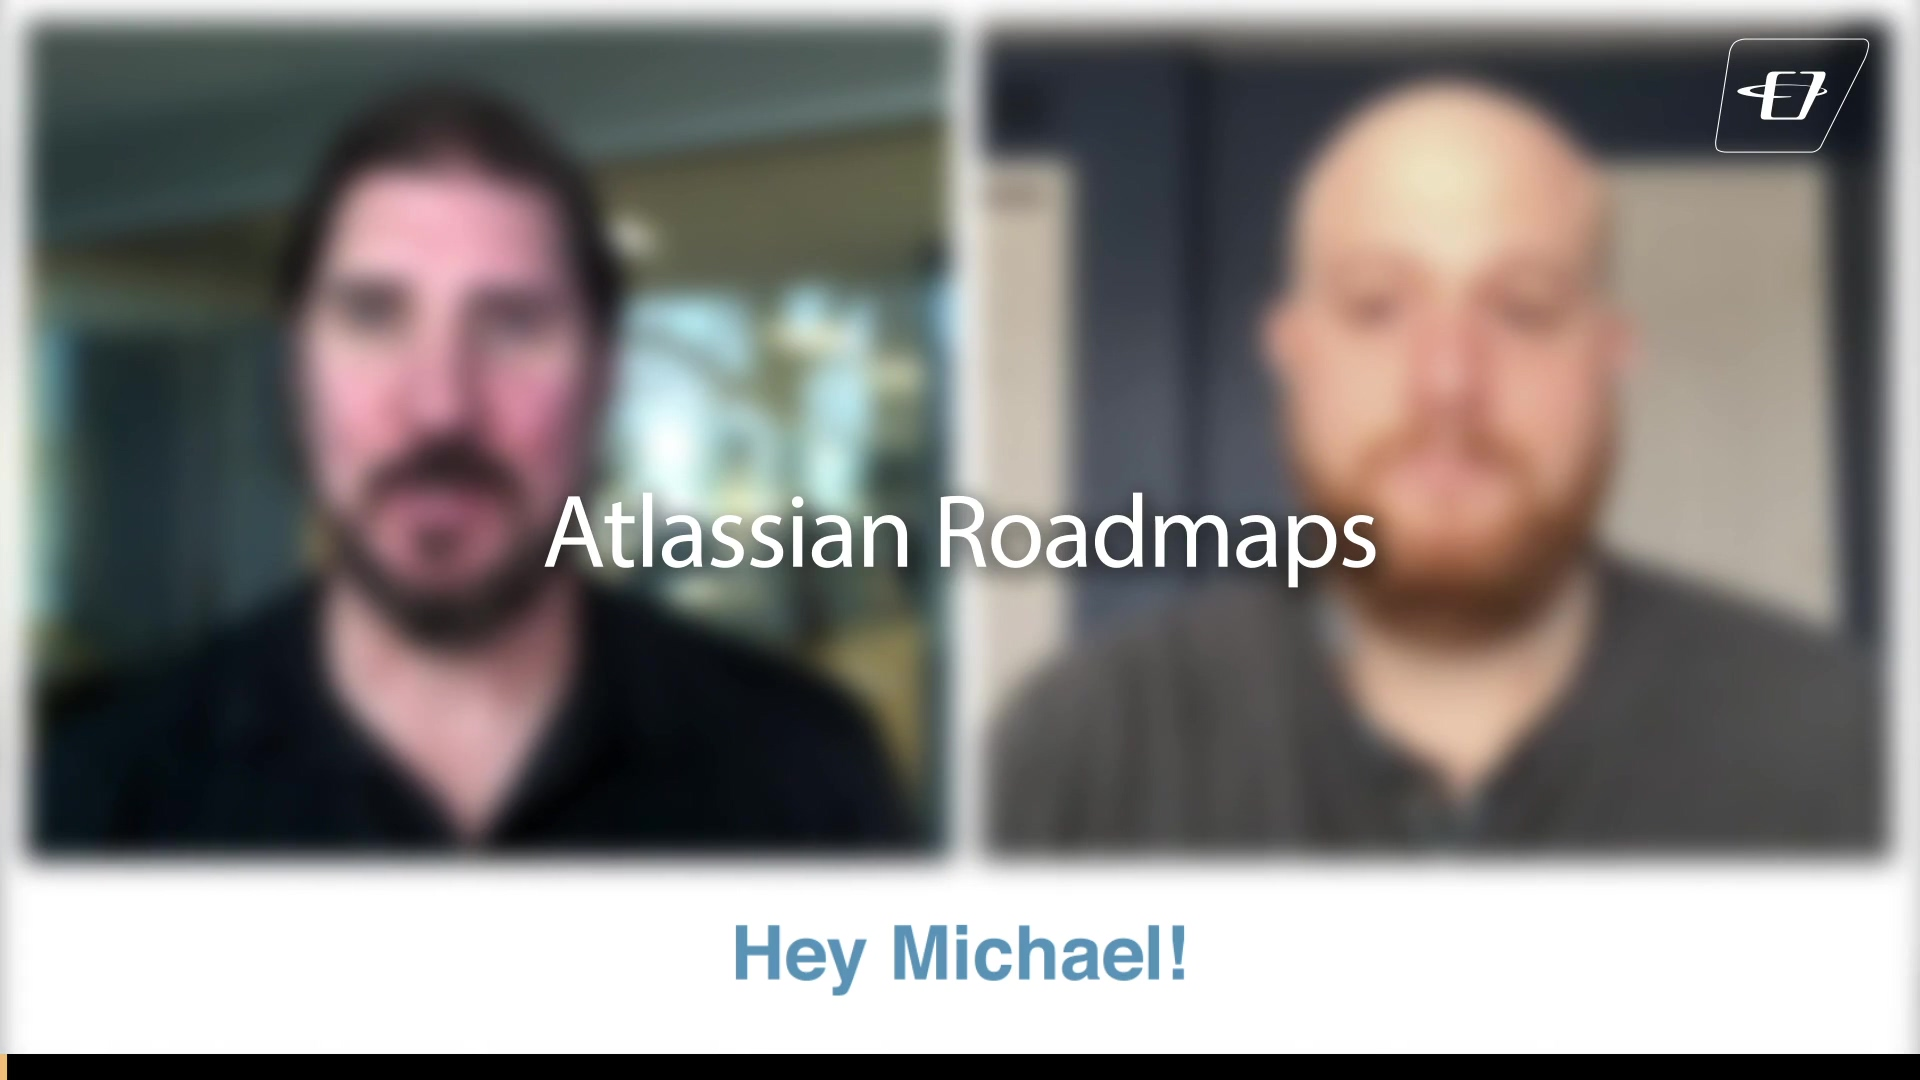 E7 Atlassian Roadmaps - Linkedin